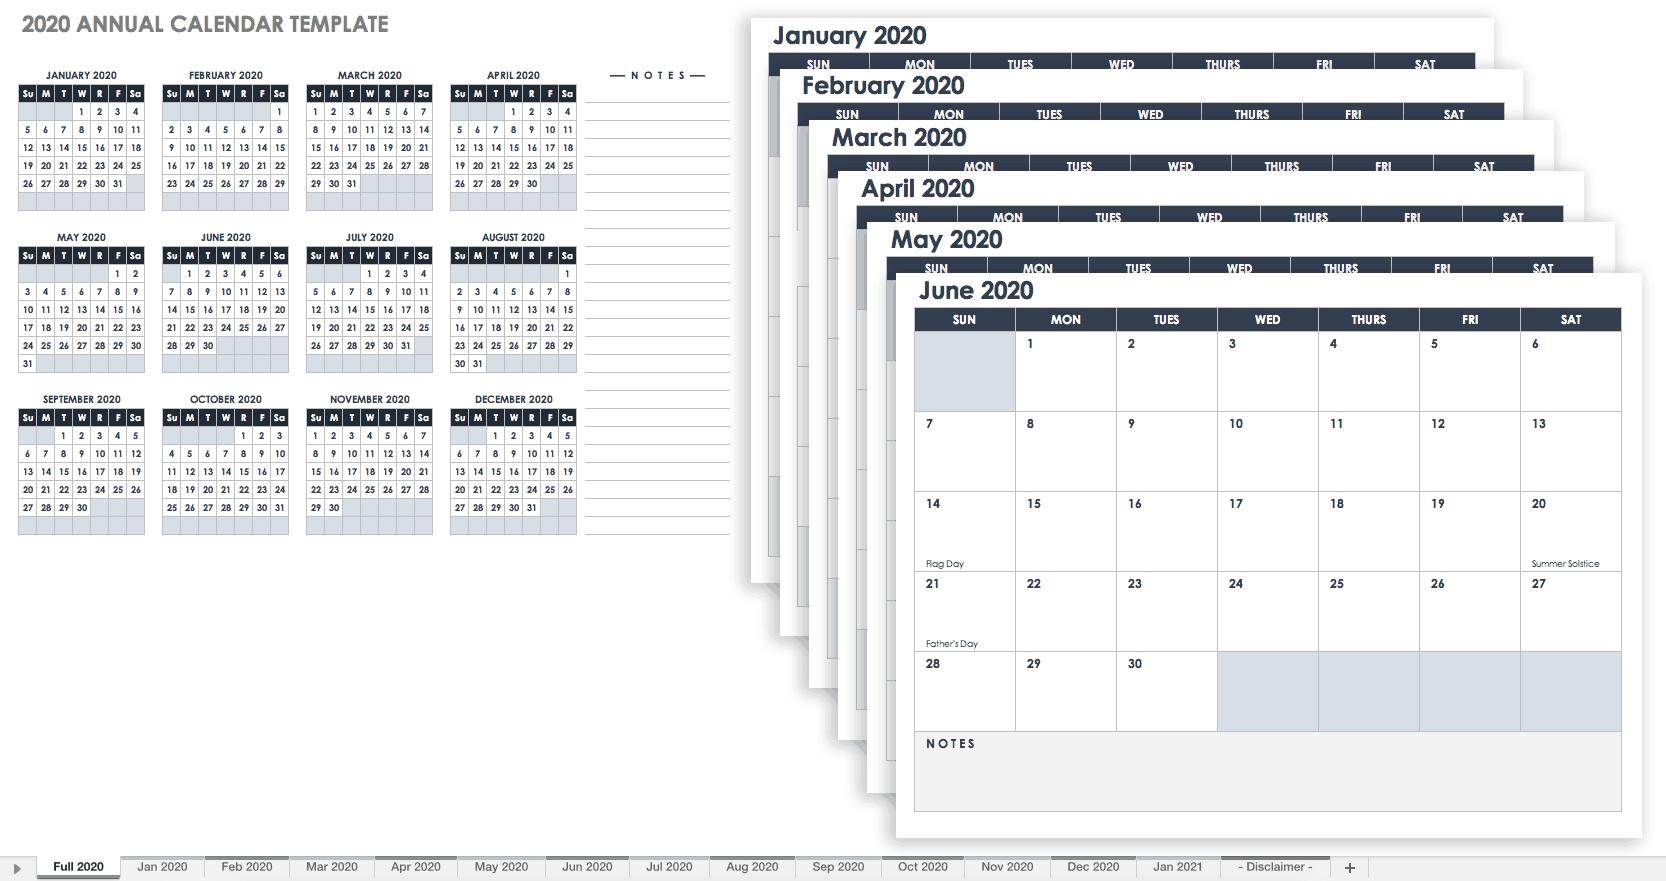 Free Blank Calendar Templates - Smartsheet-Calendar Templates 3Months Per Page